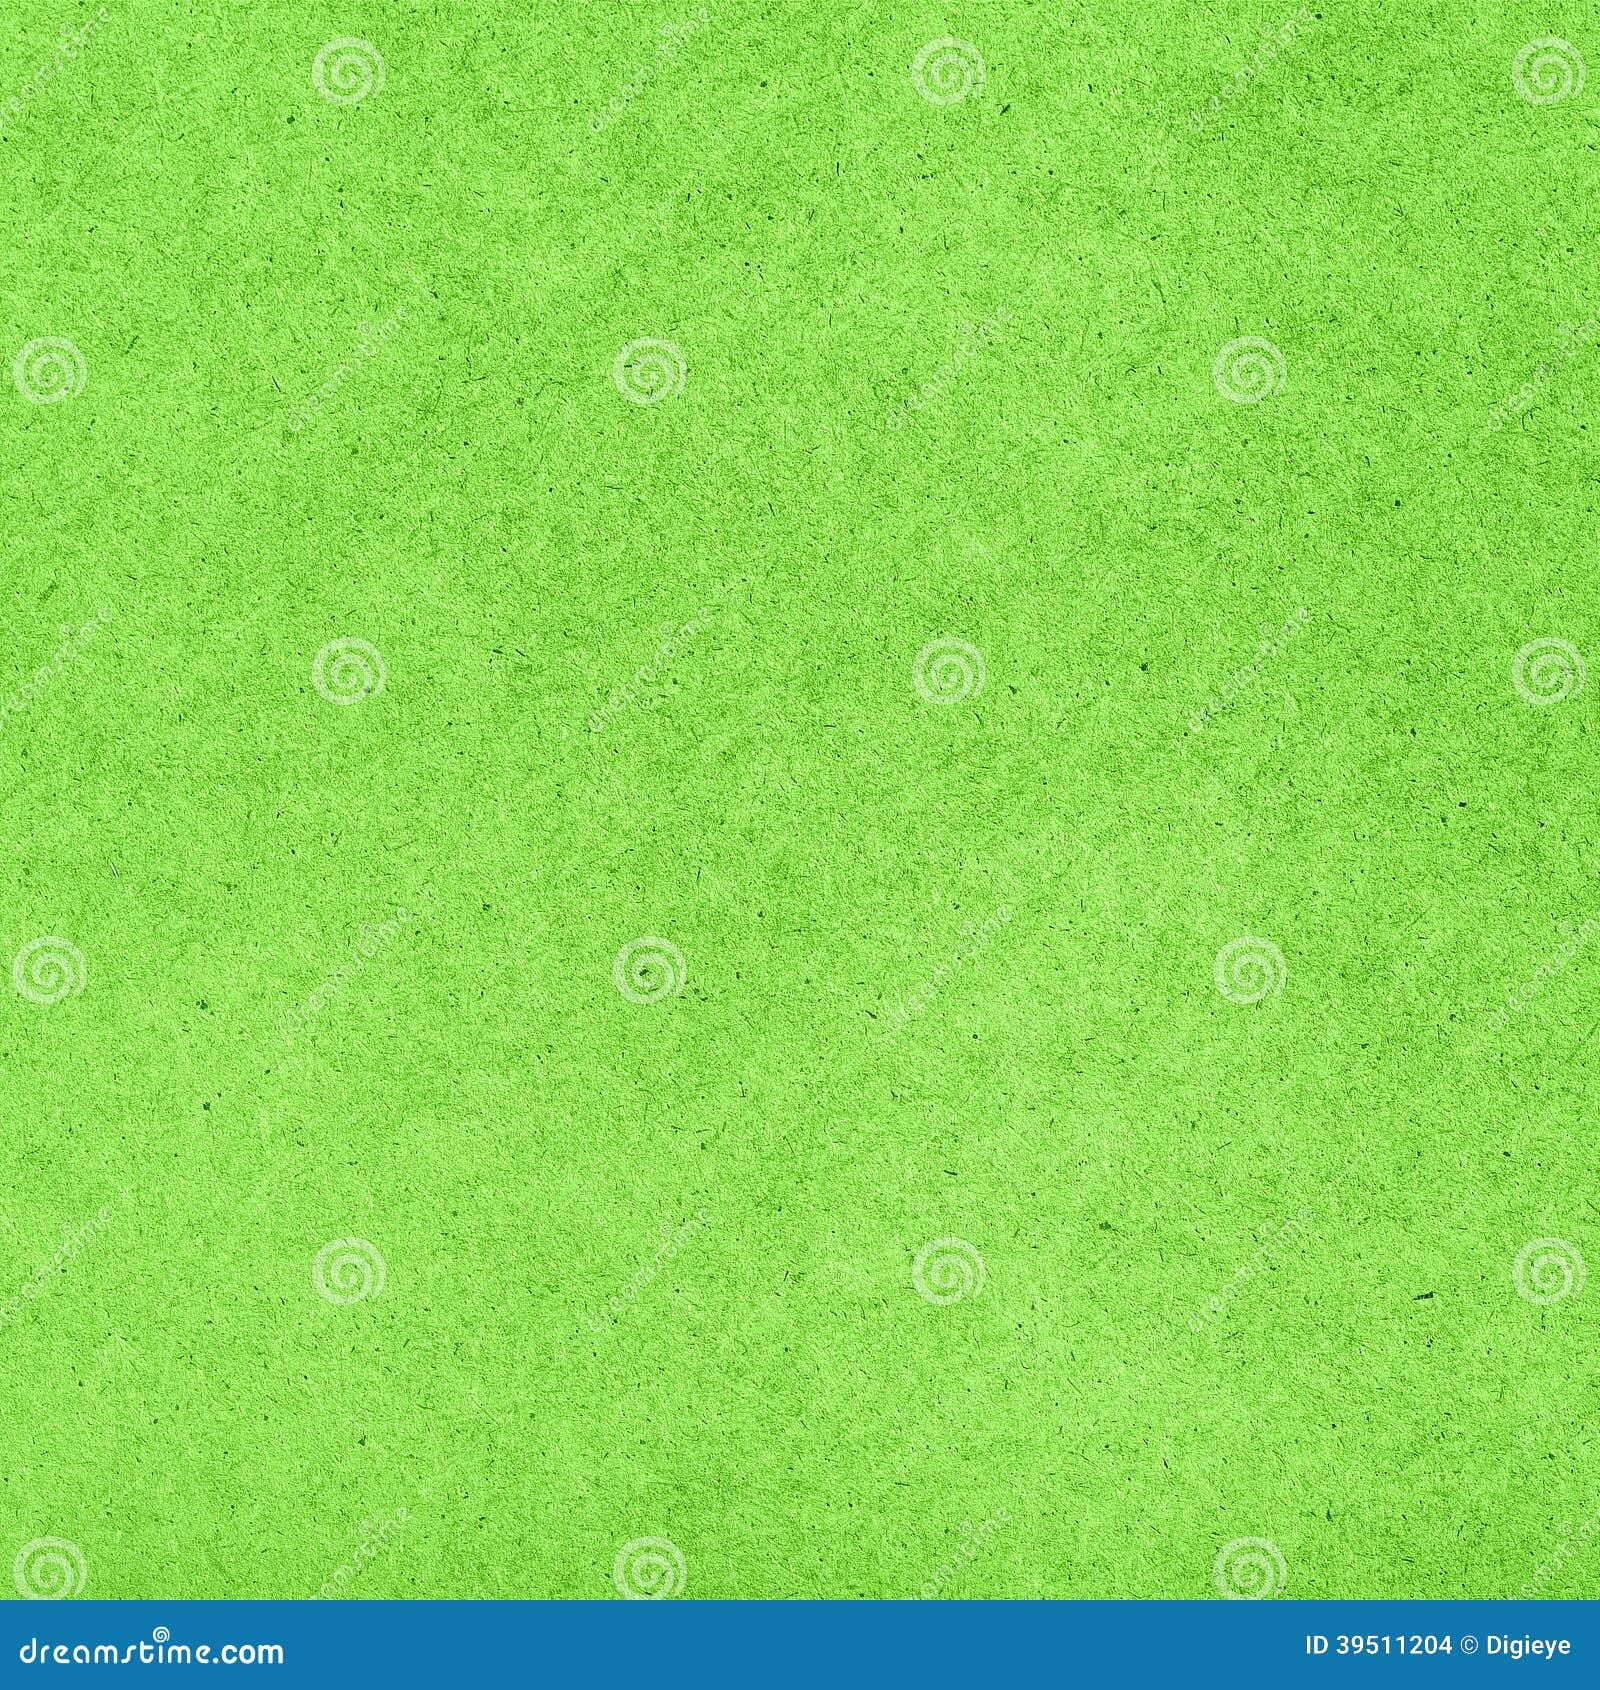 Light green paper background